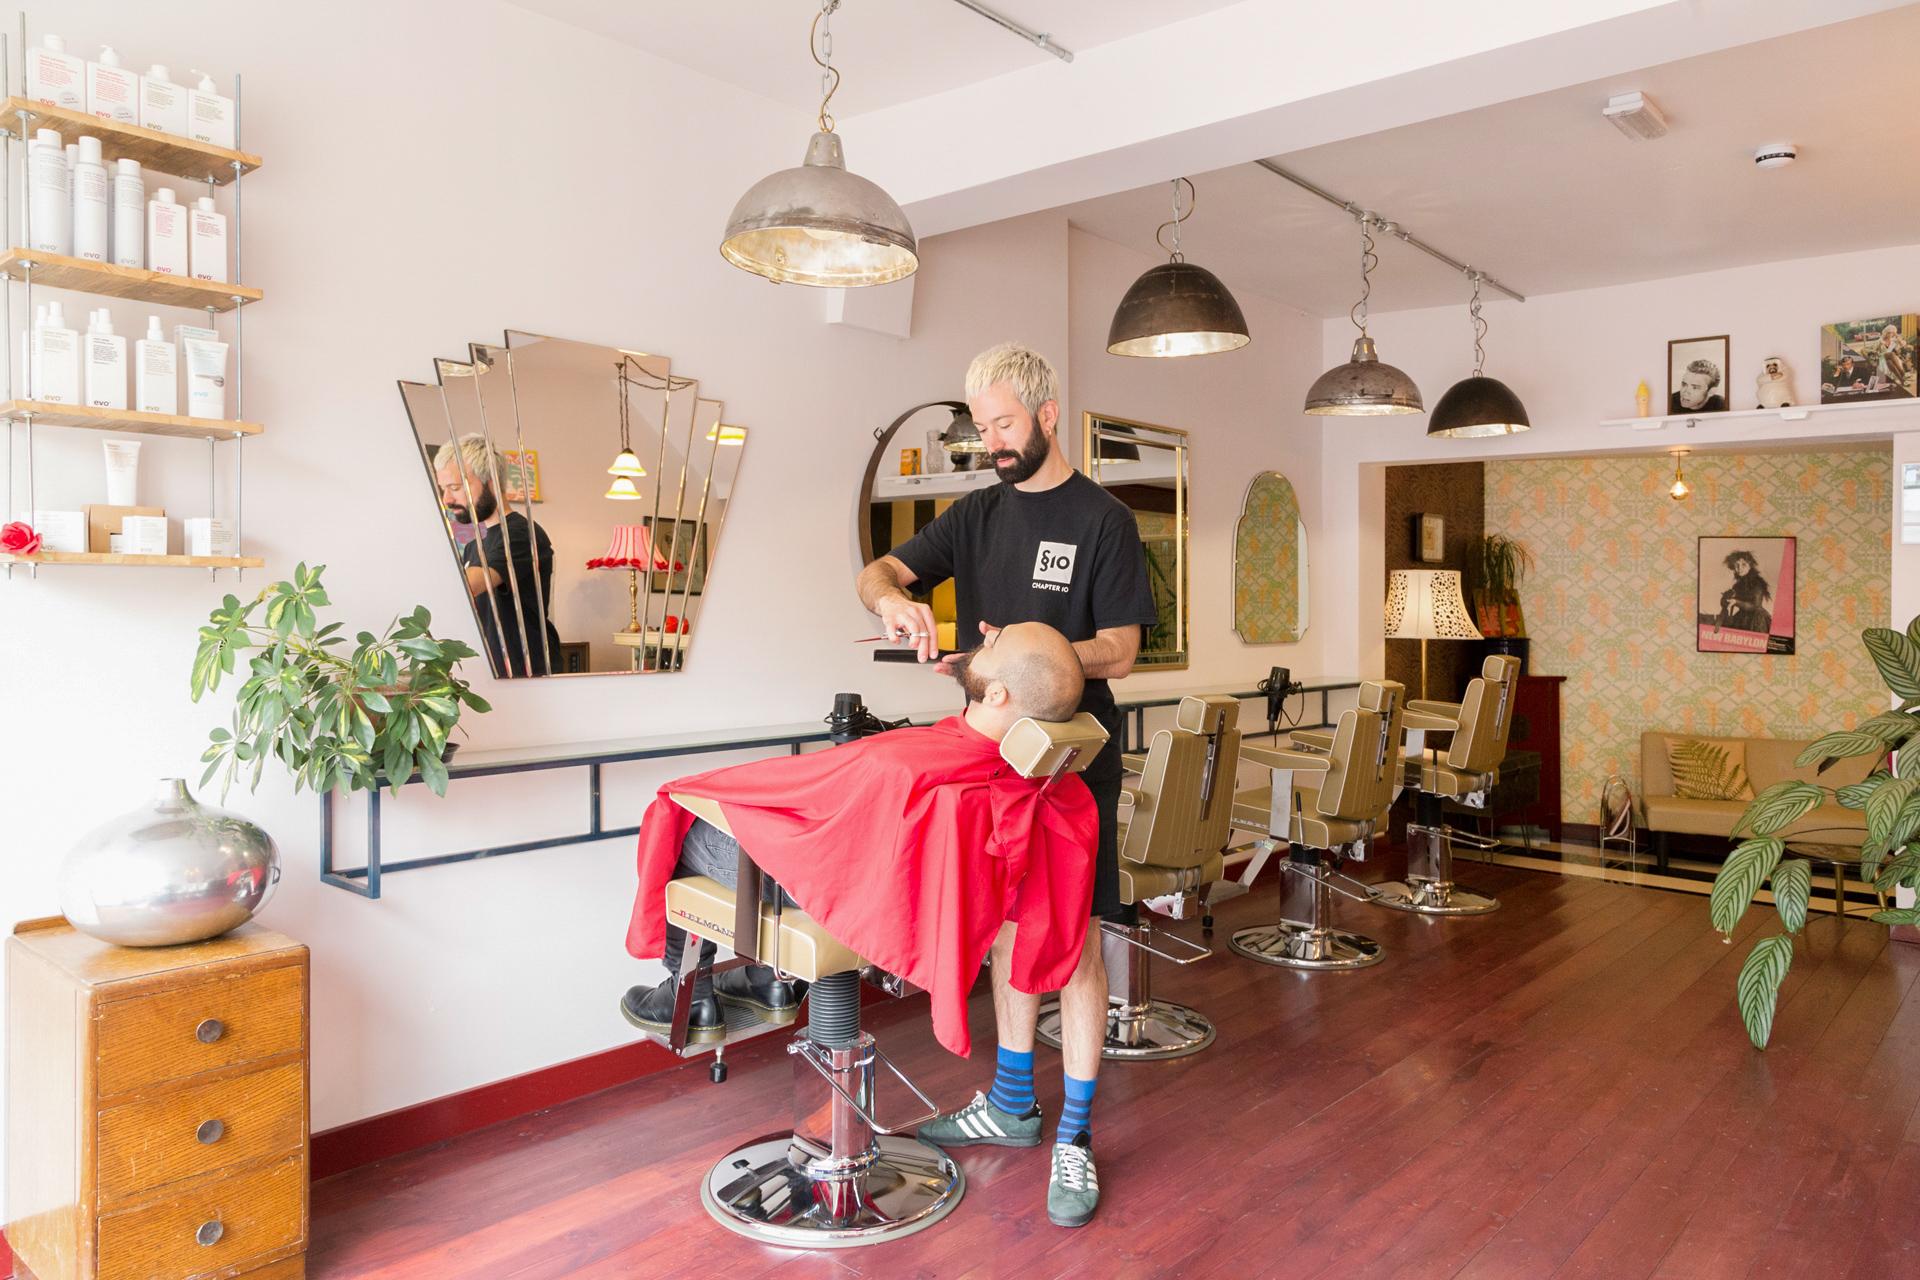 The vegan hair salon guide to London